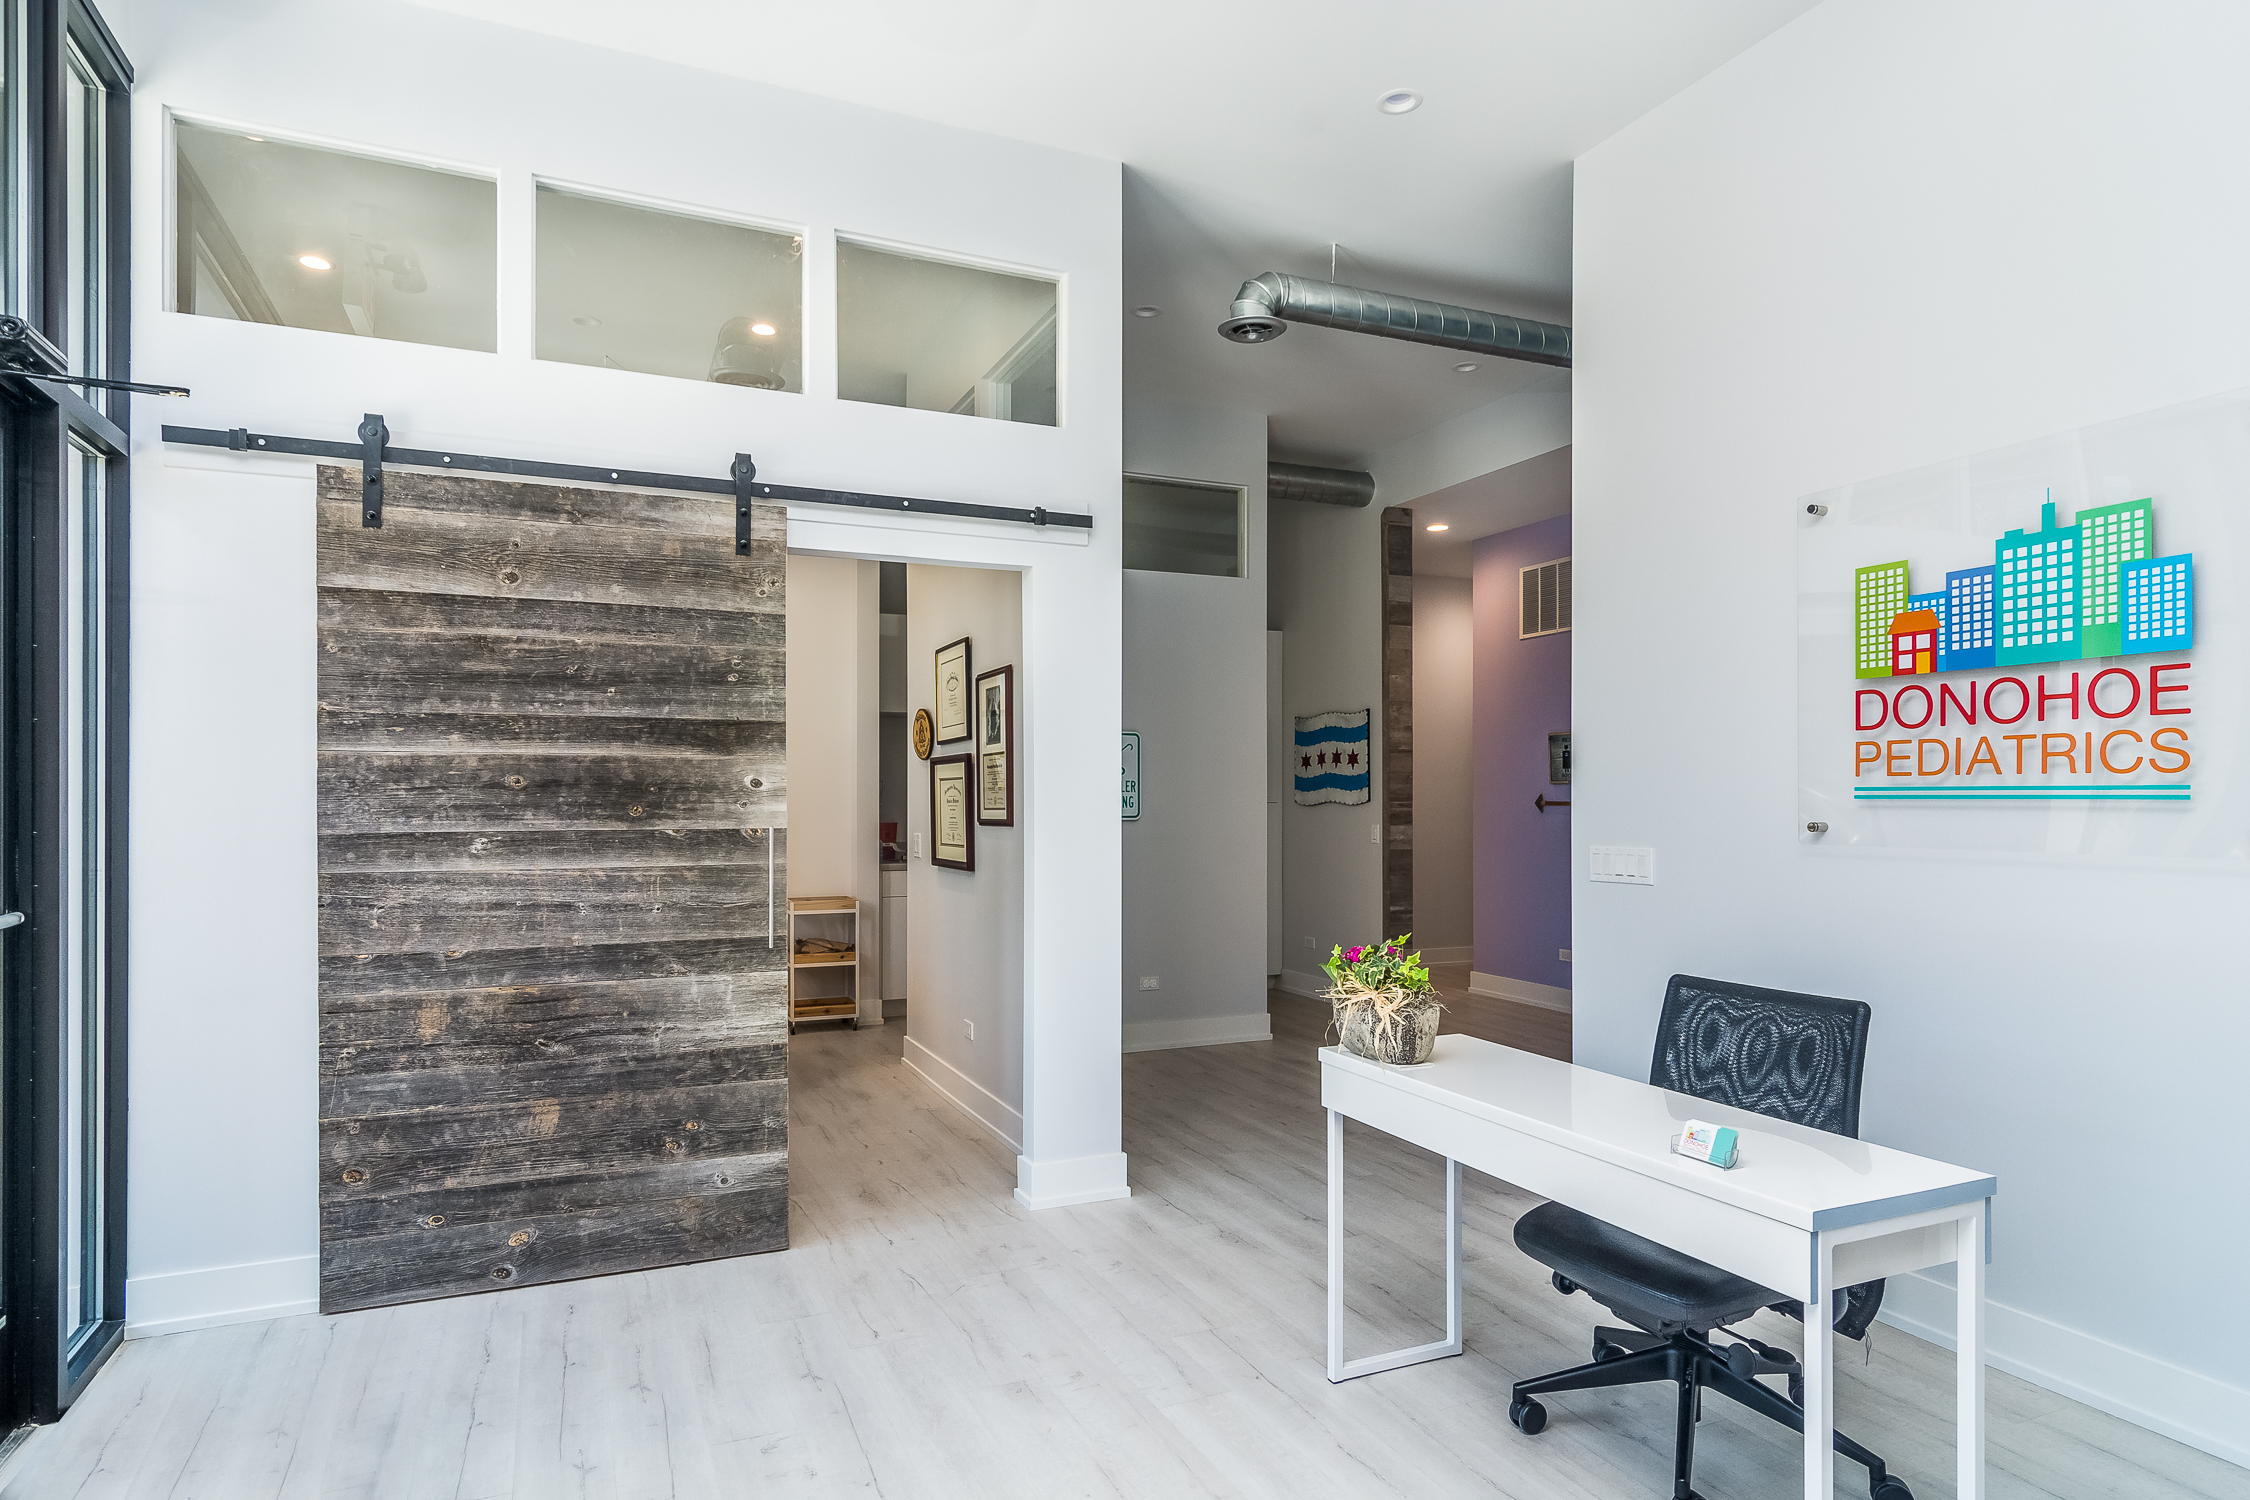 Modern Pediatric office interior design.jpg